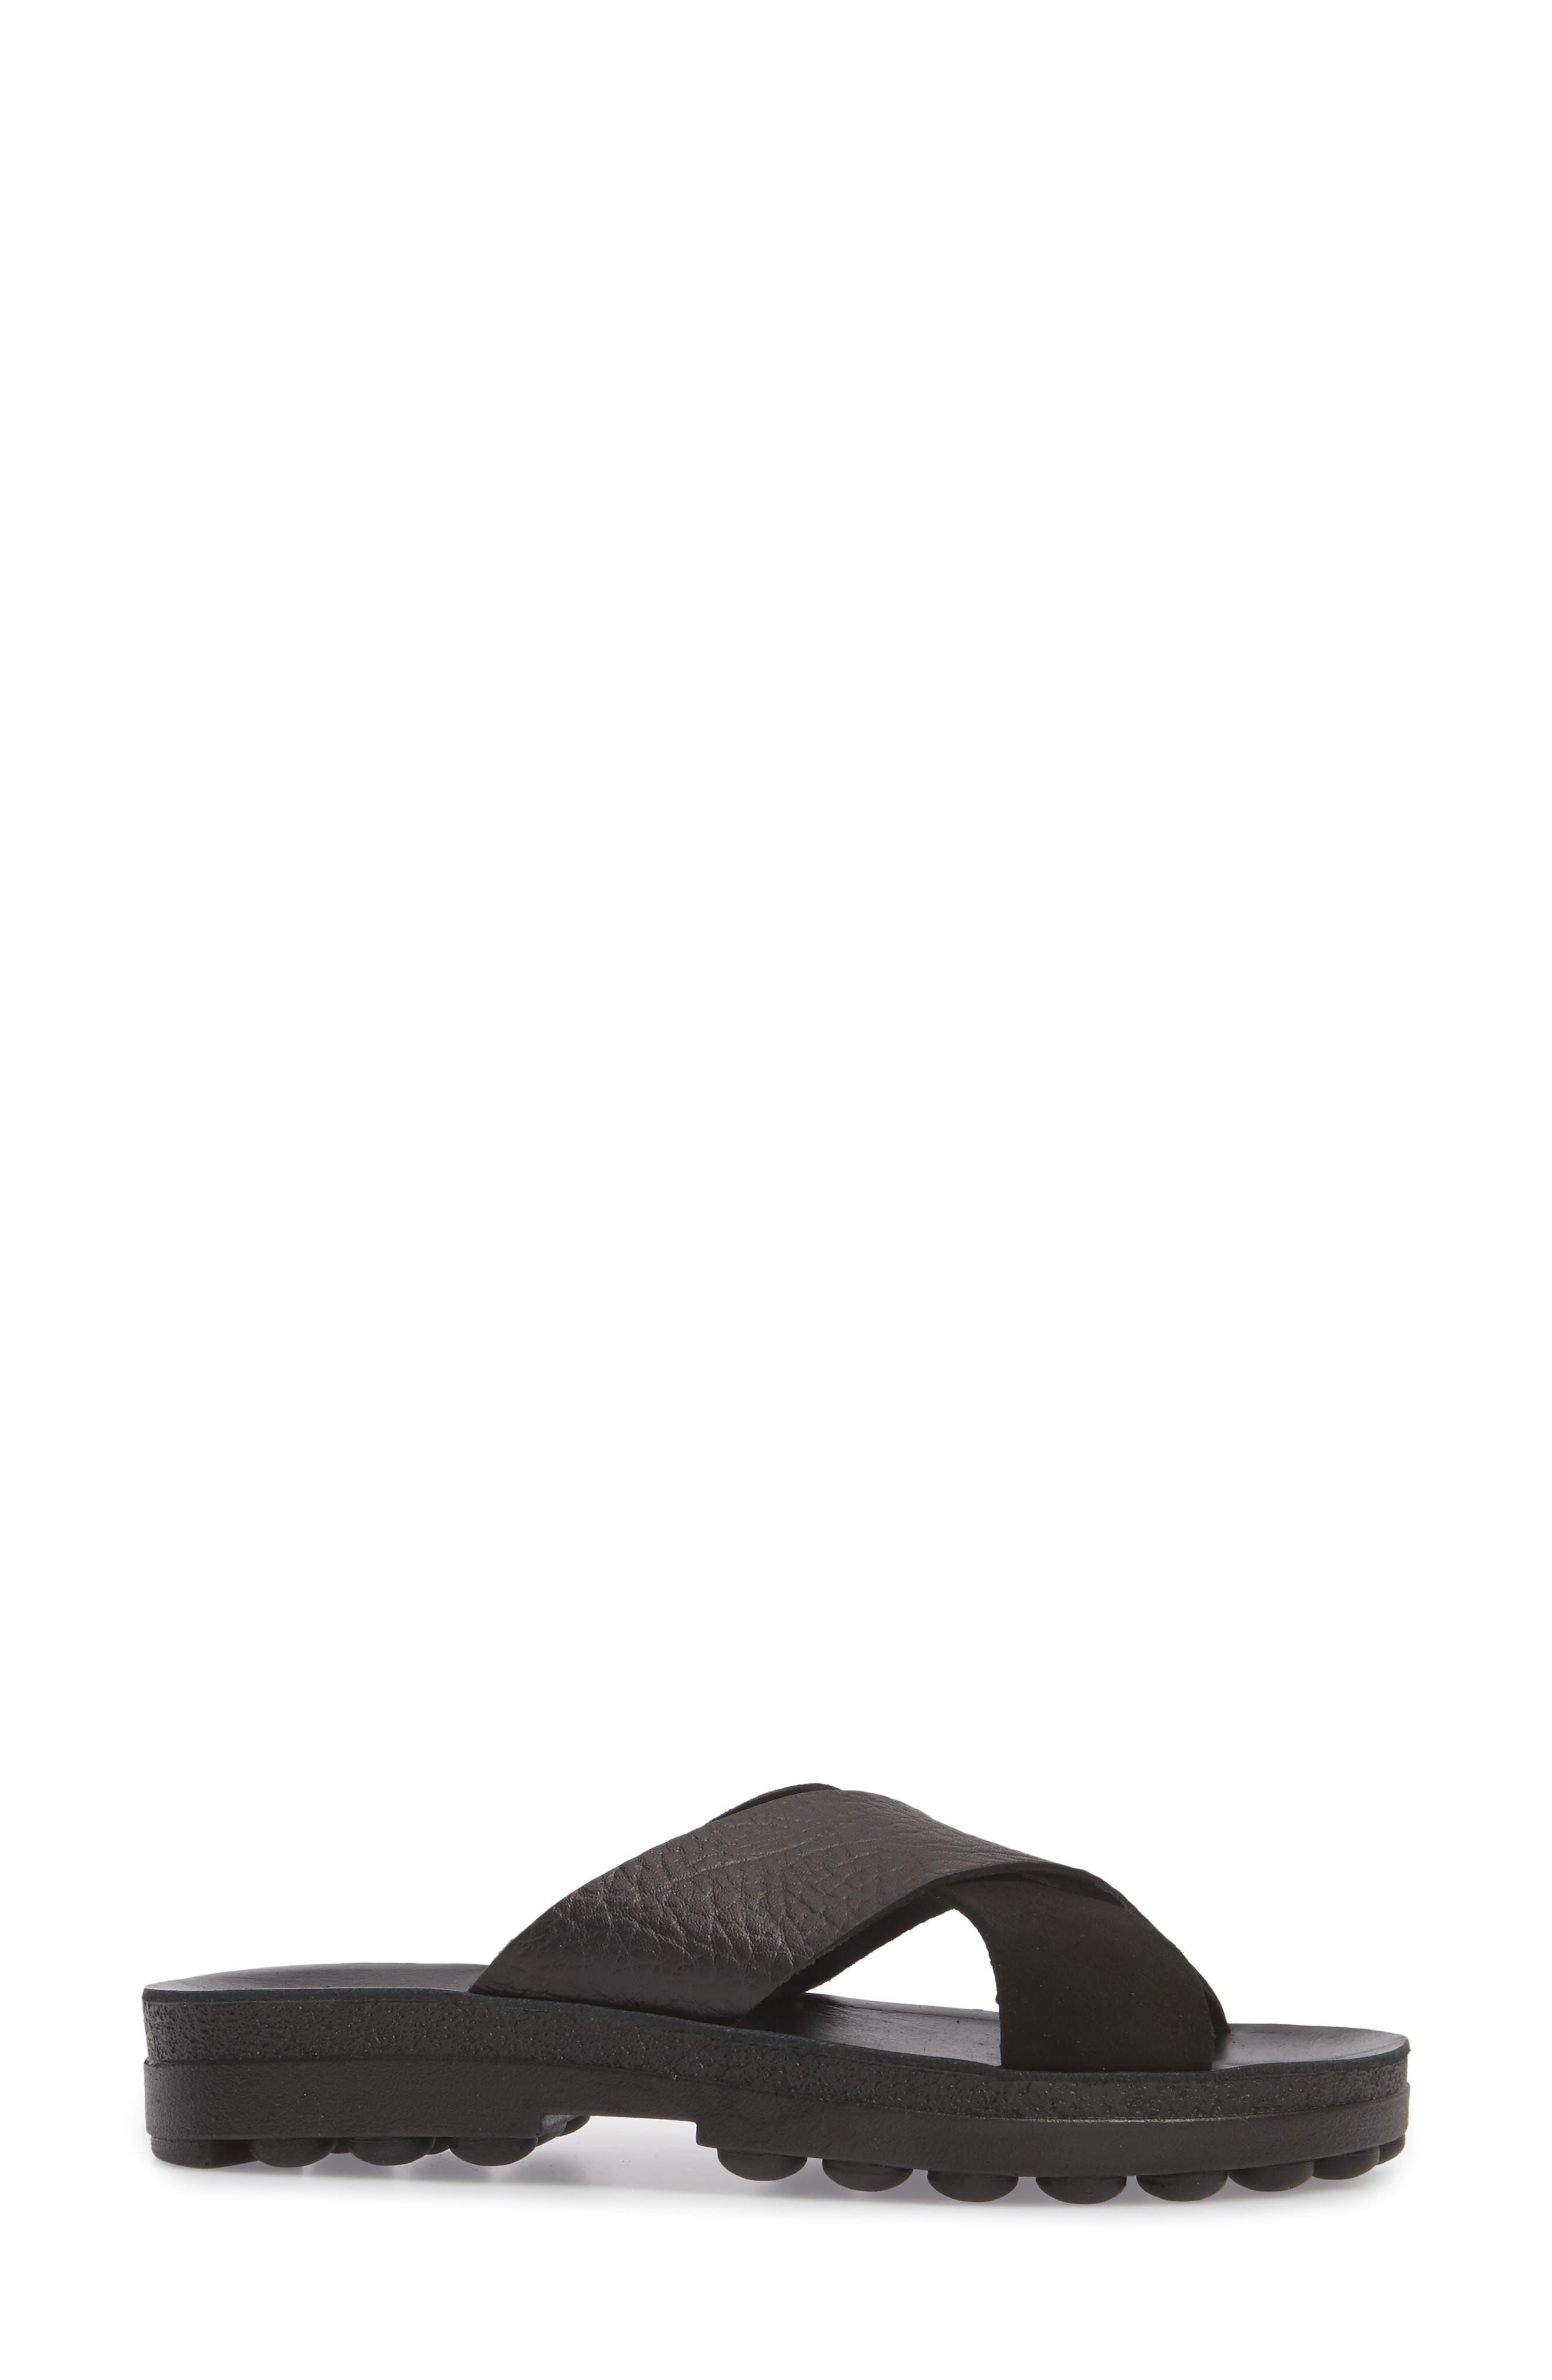 Charis Slide Sandal,                             Alternate thumbnail 3, color,                             BLACK DOLARO LEATHER